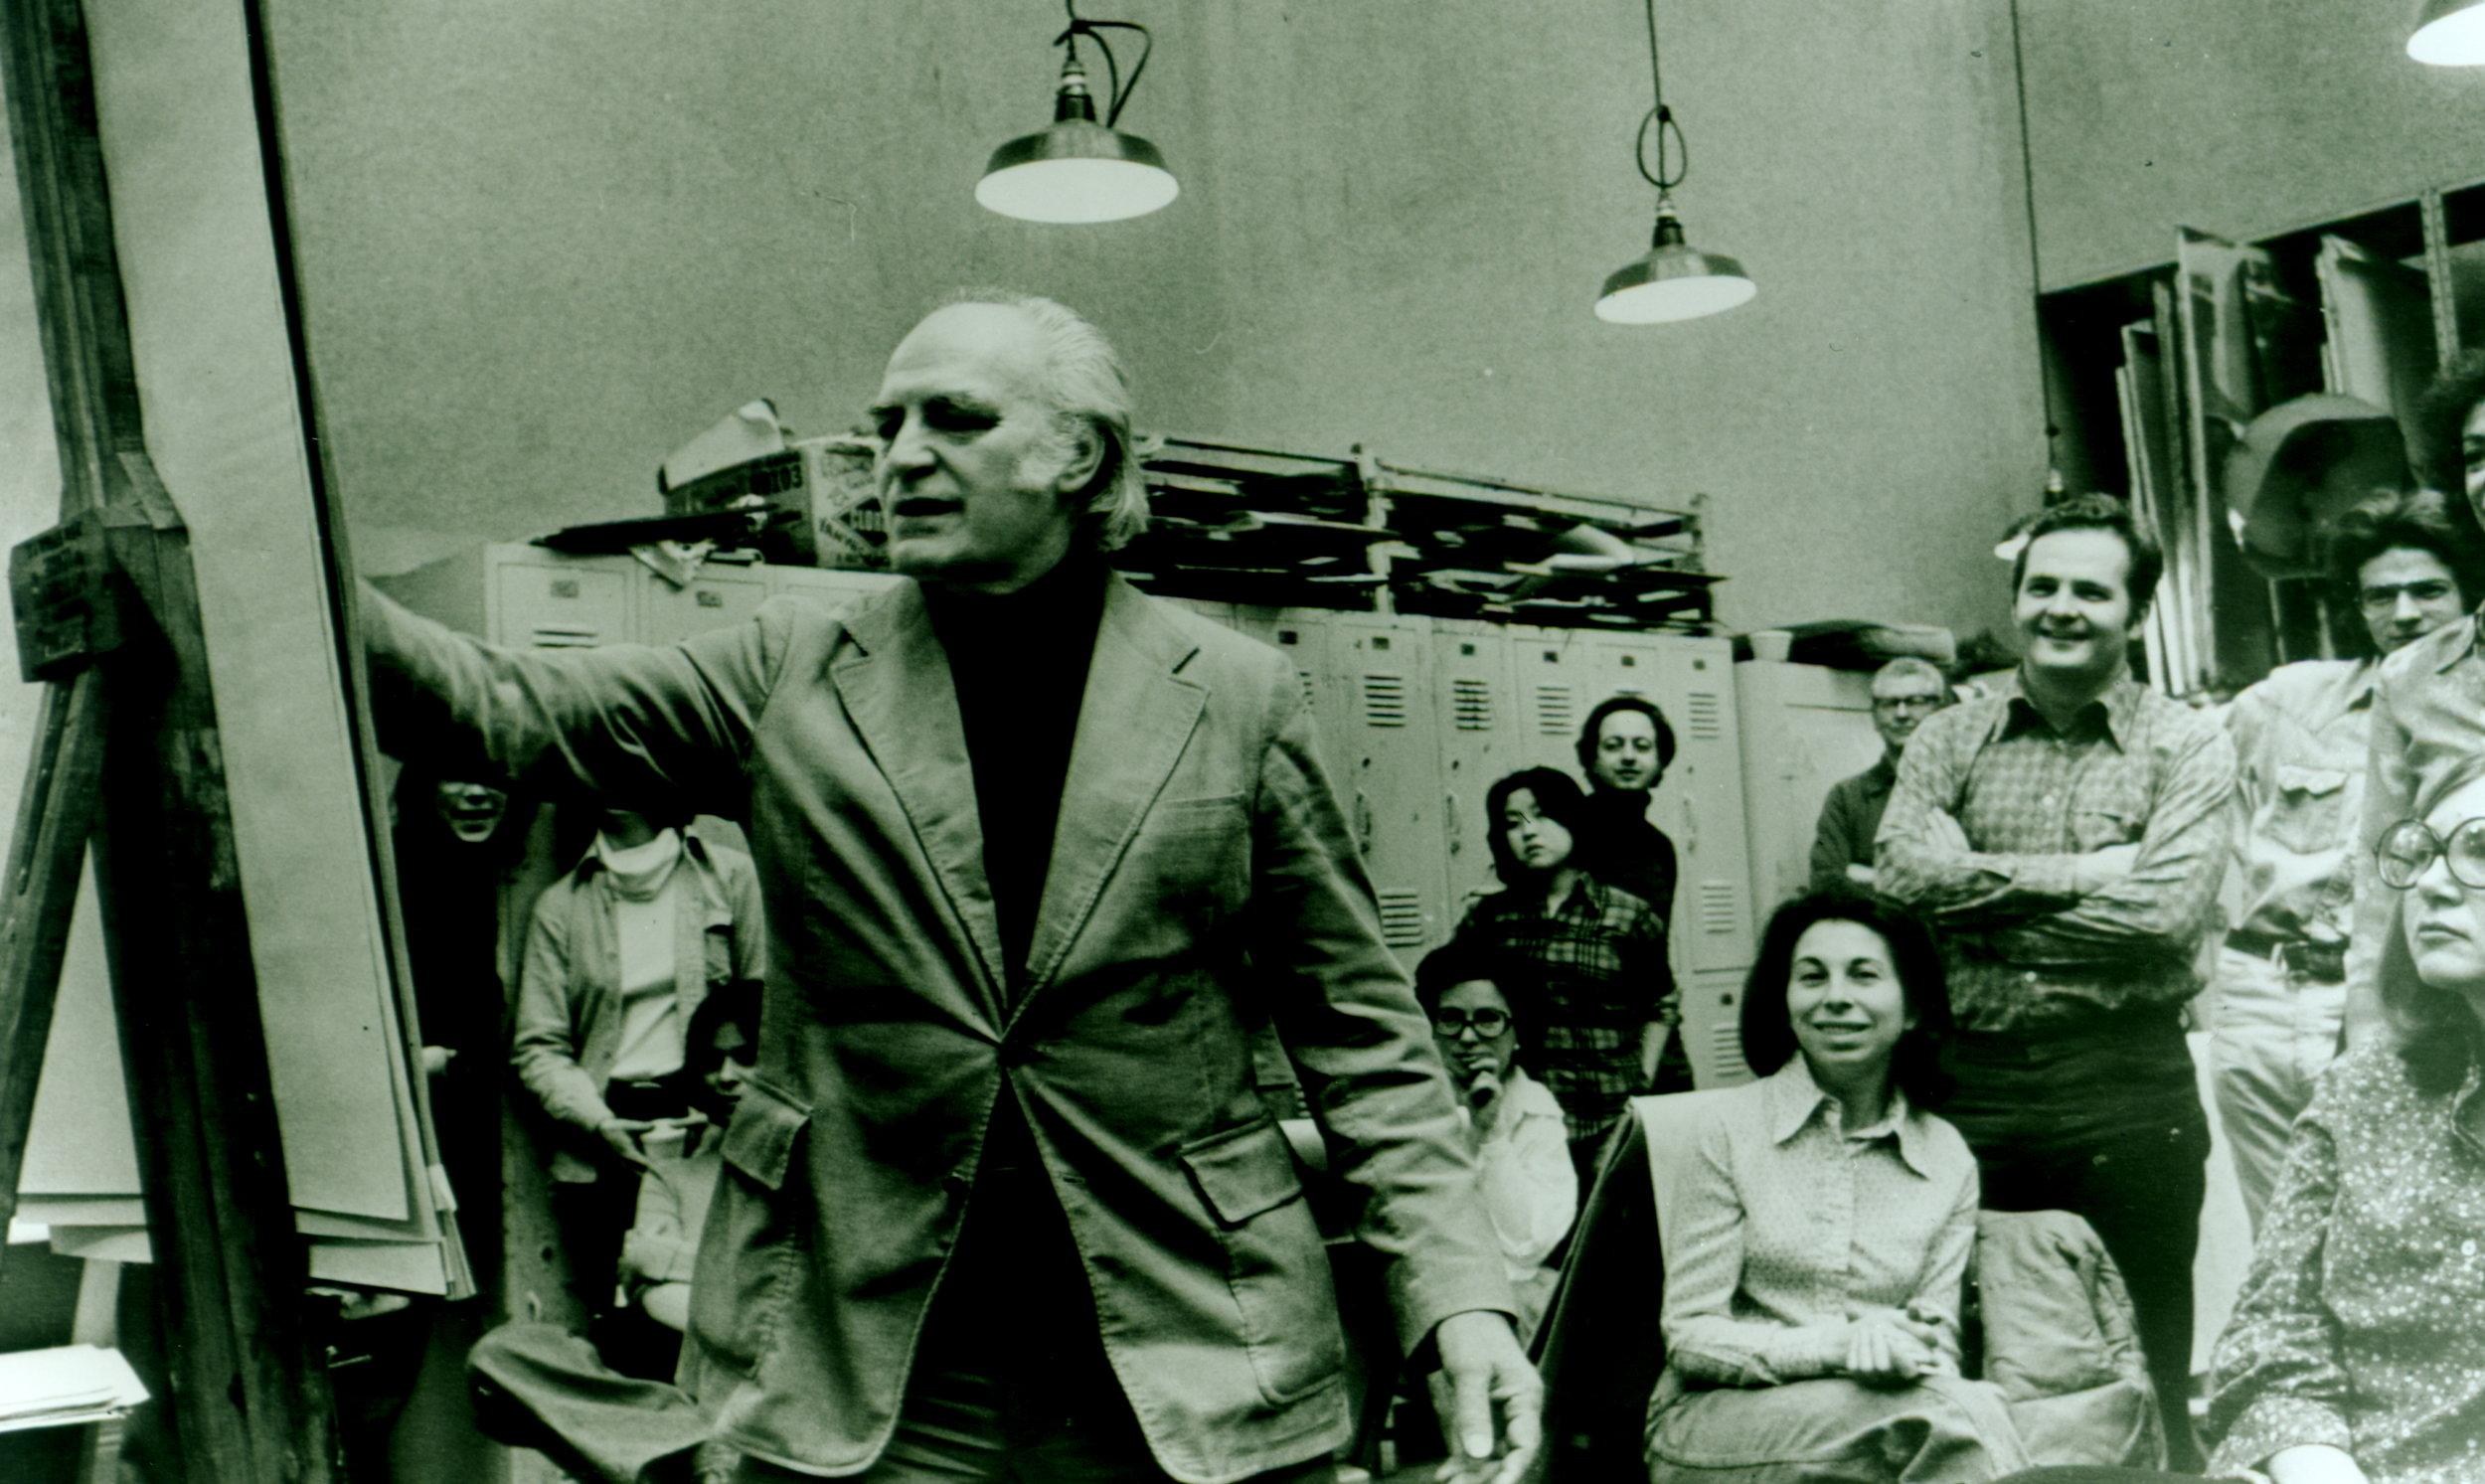 Photo, Sidney Waintrob of Budd Studios 1978